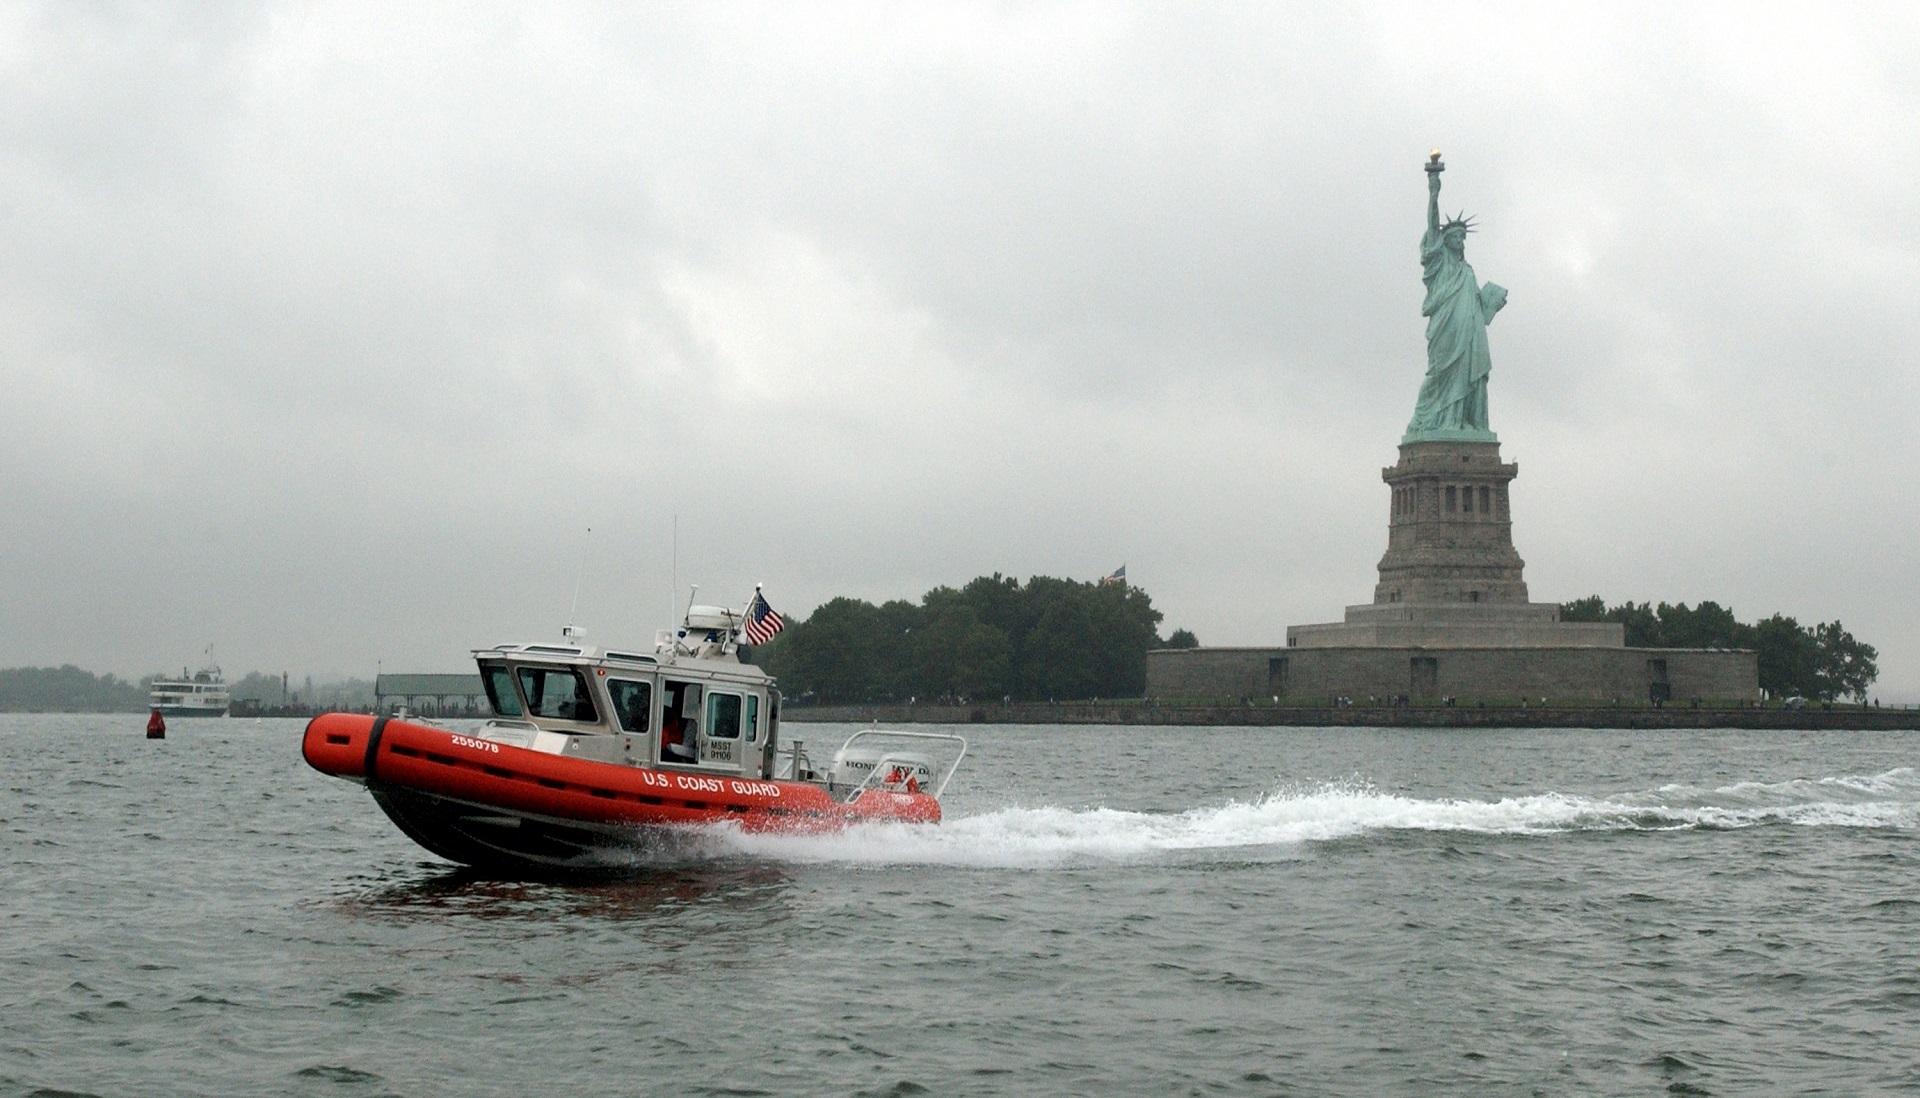 Response Boat, Boat, Guard, Ocean, Patrol, HQ Photo